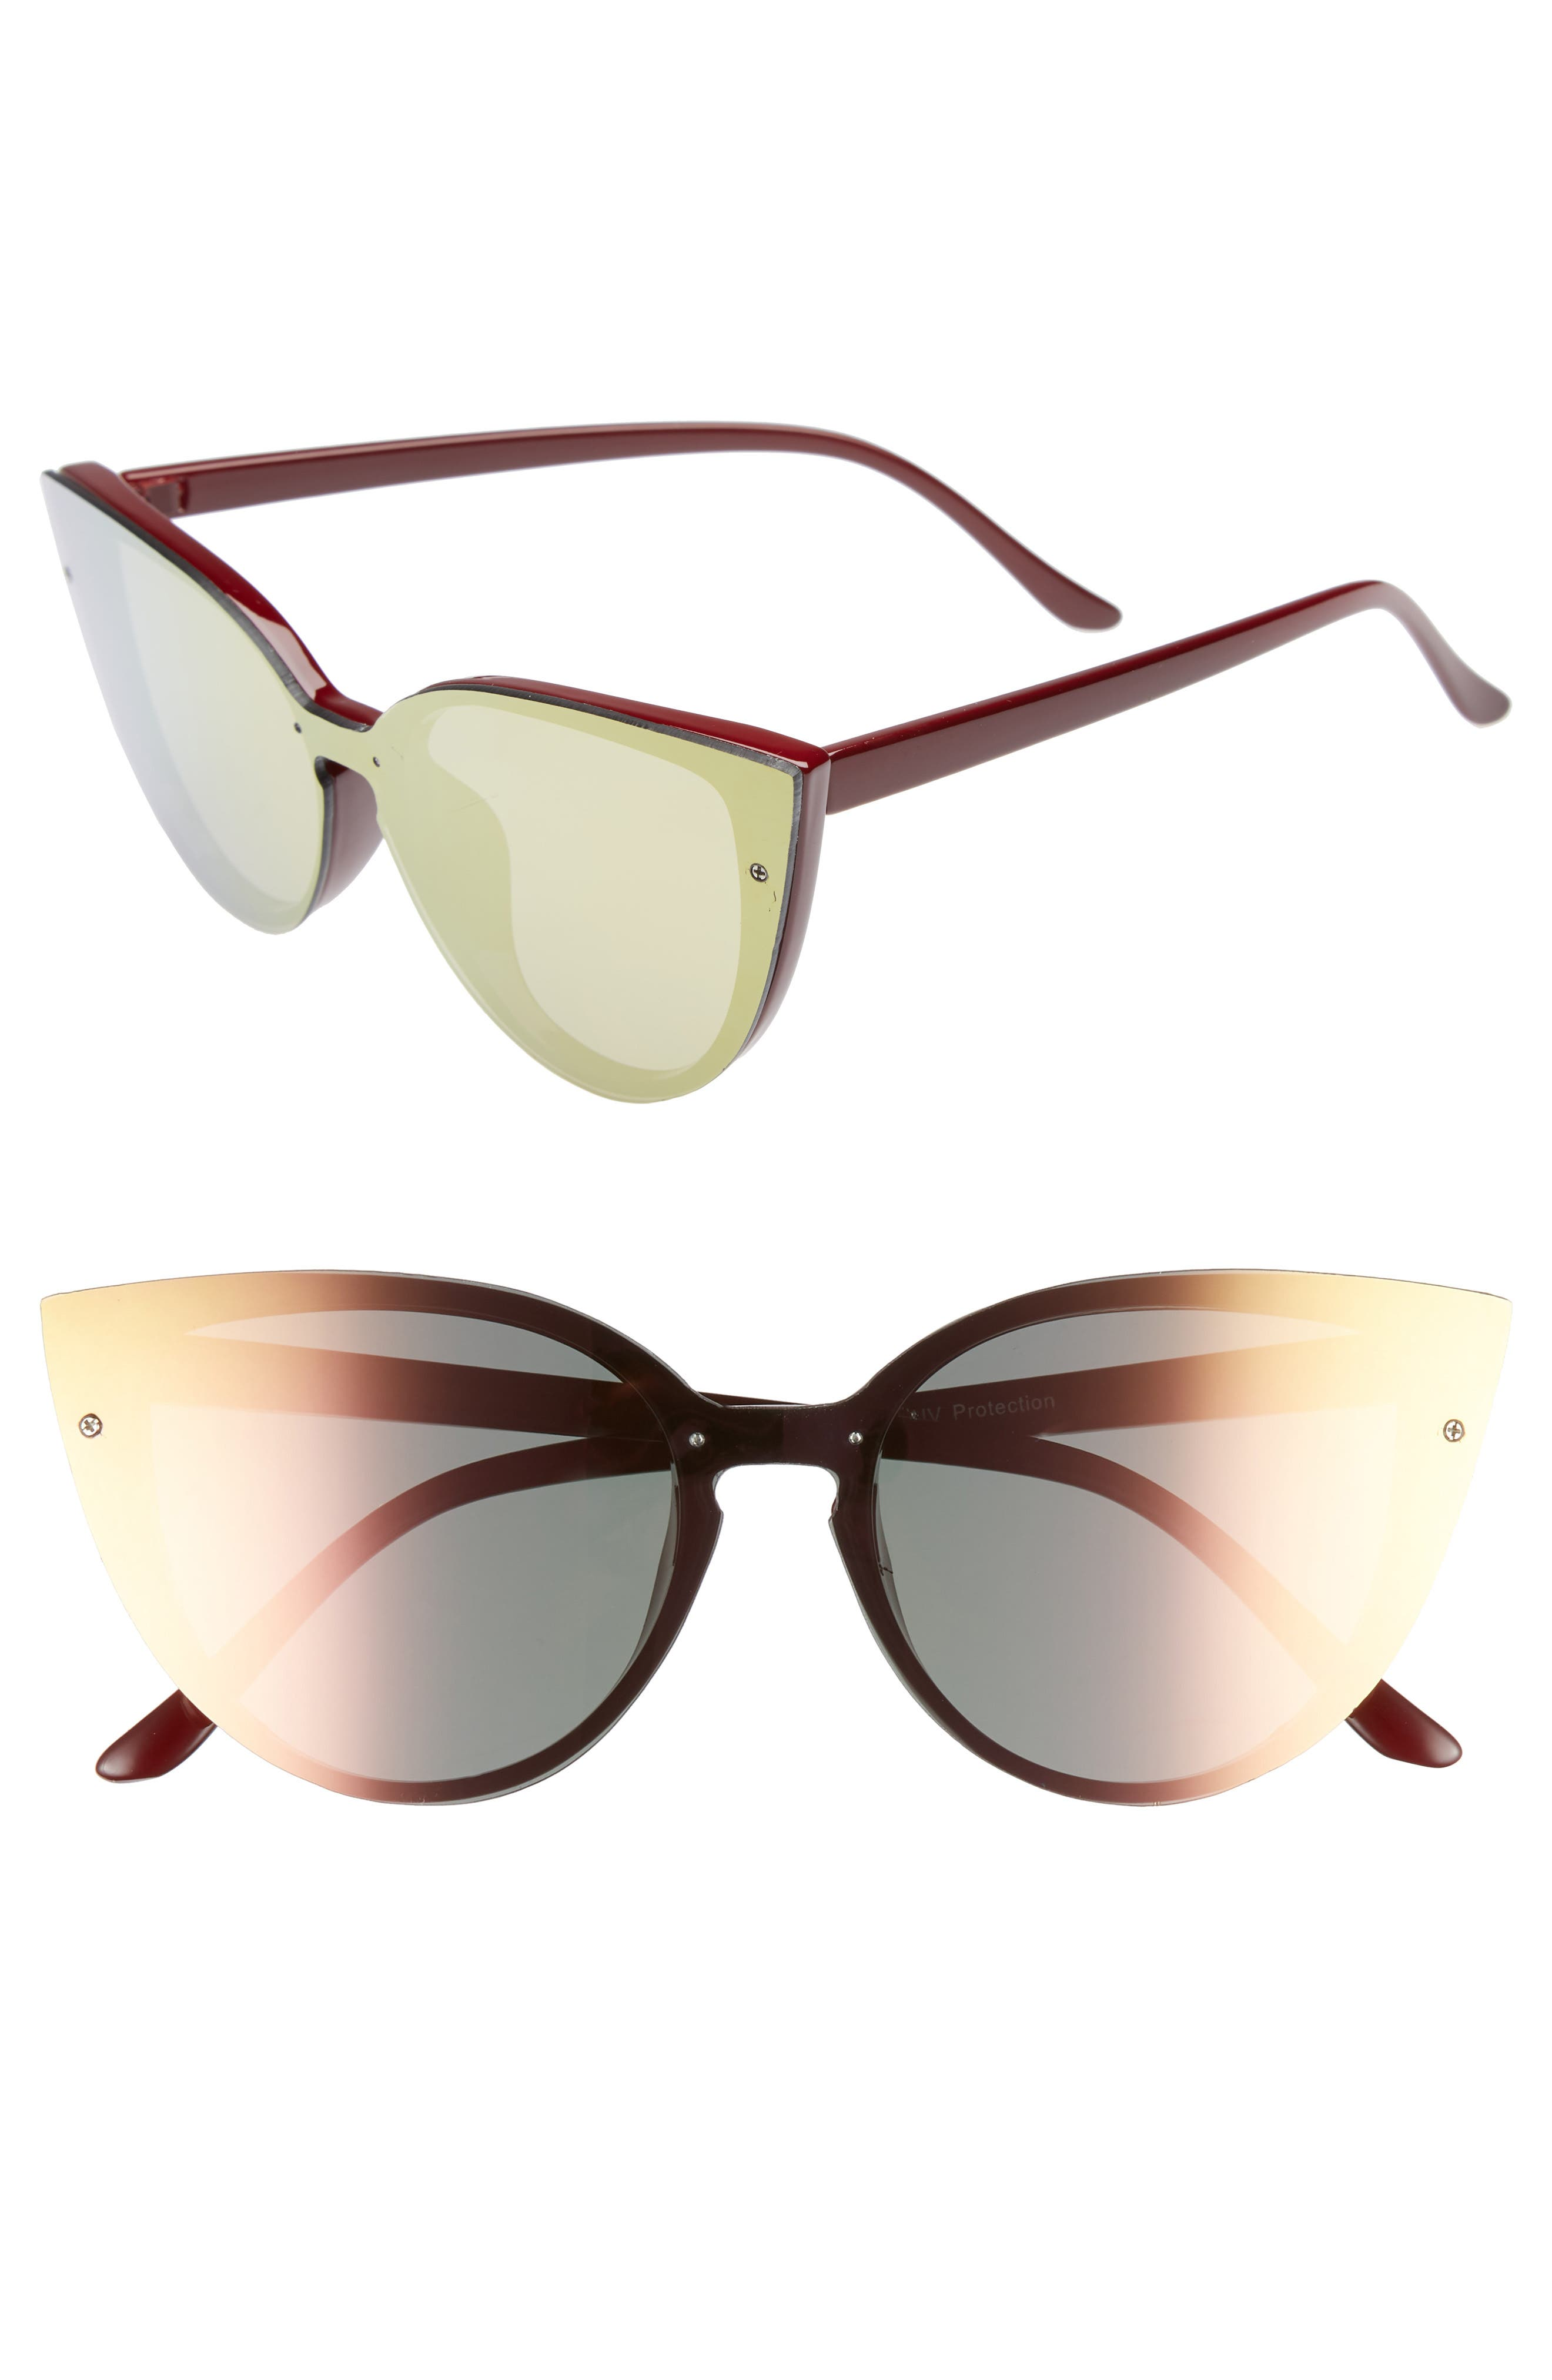 52mm Flat Cat Eye Sunglasses,                         Main,                         color, Burgundy/ Green